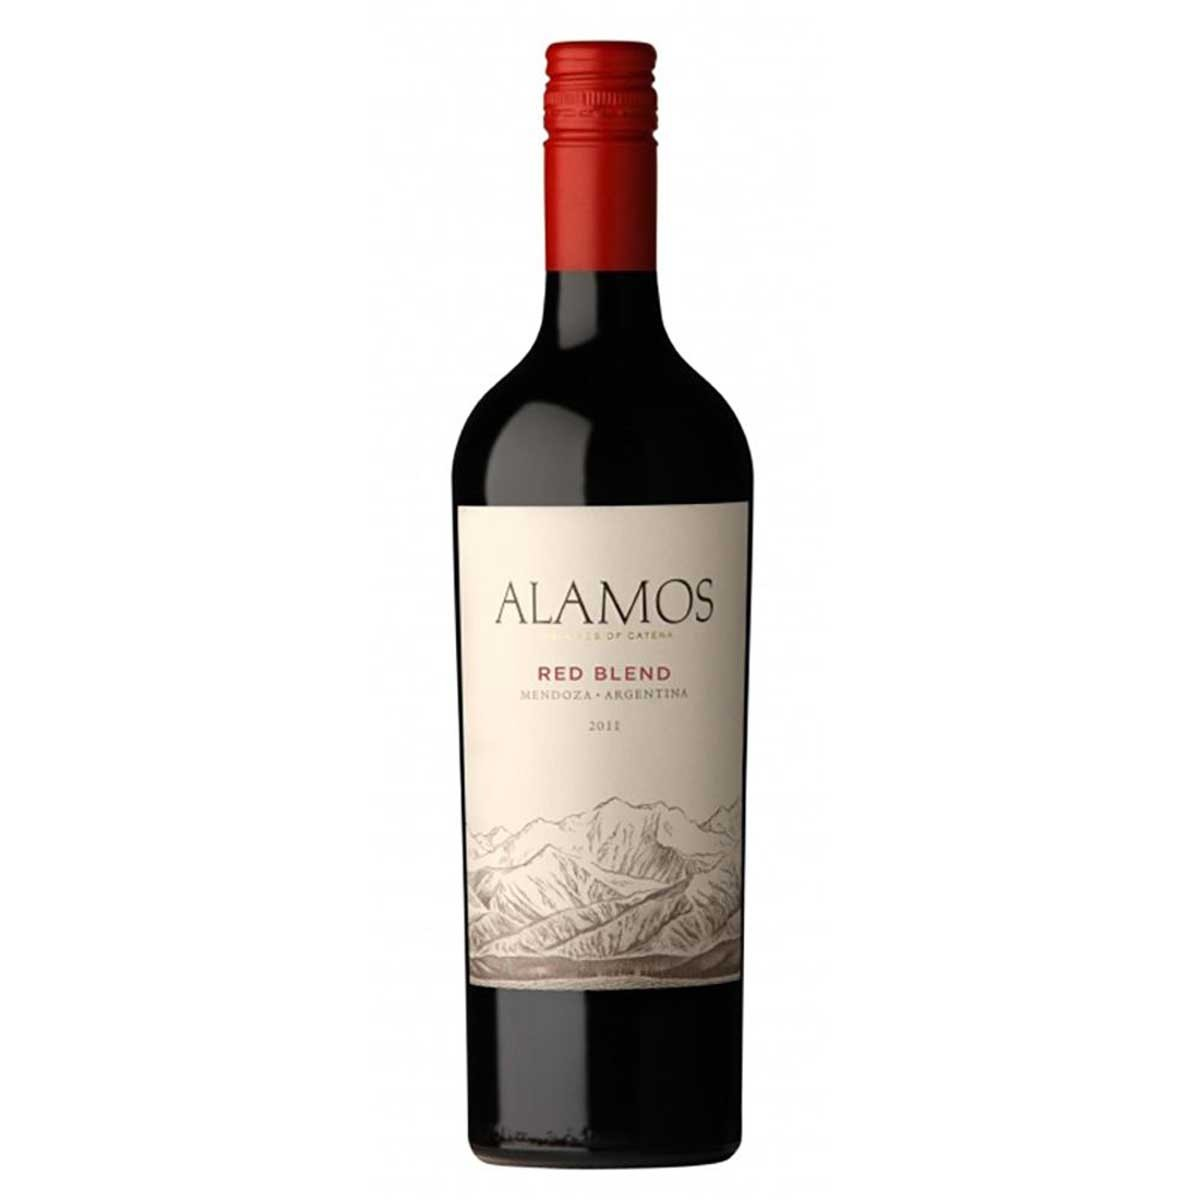 Vinho Argentino Tinto Alamos Blend 2018 Catena Wines 750ml